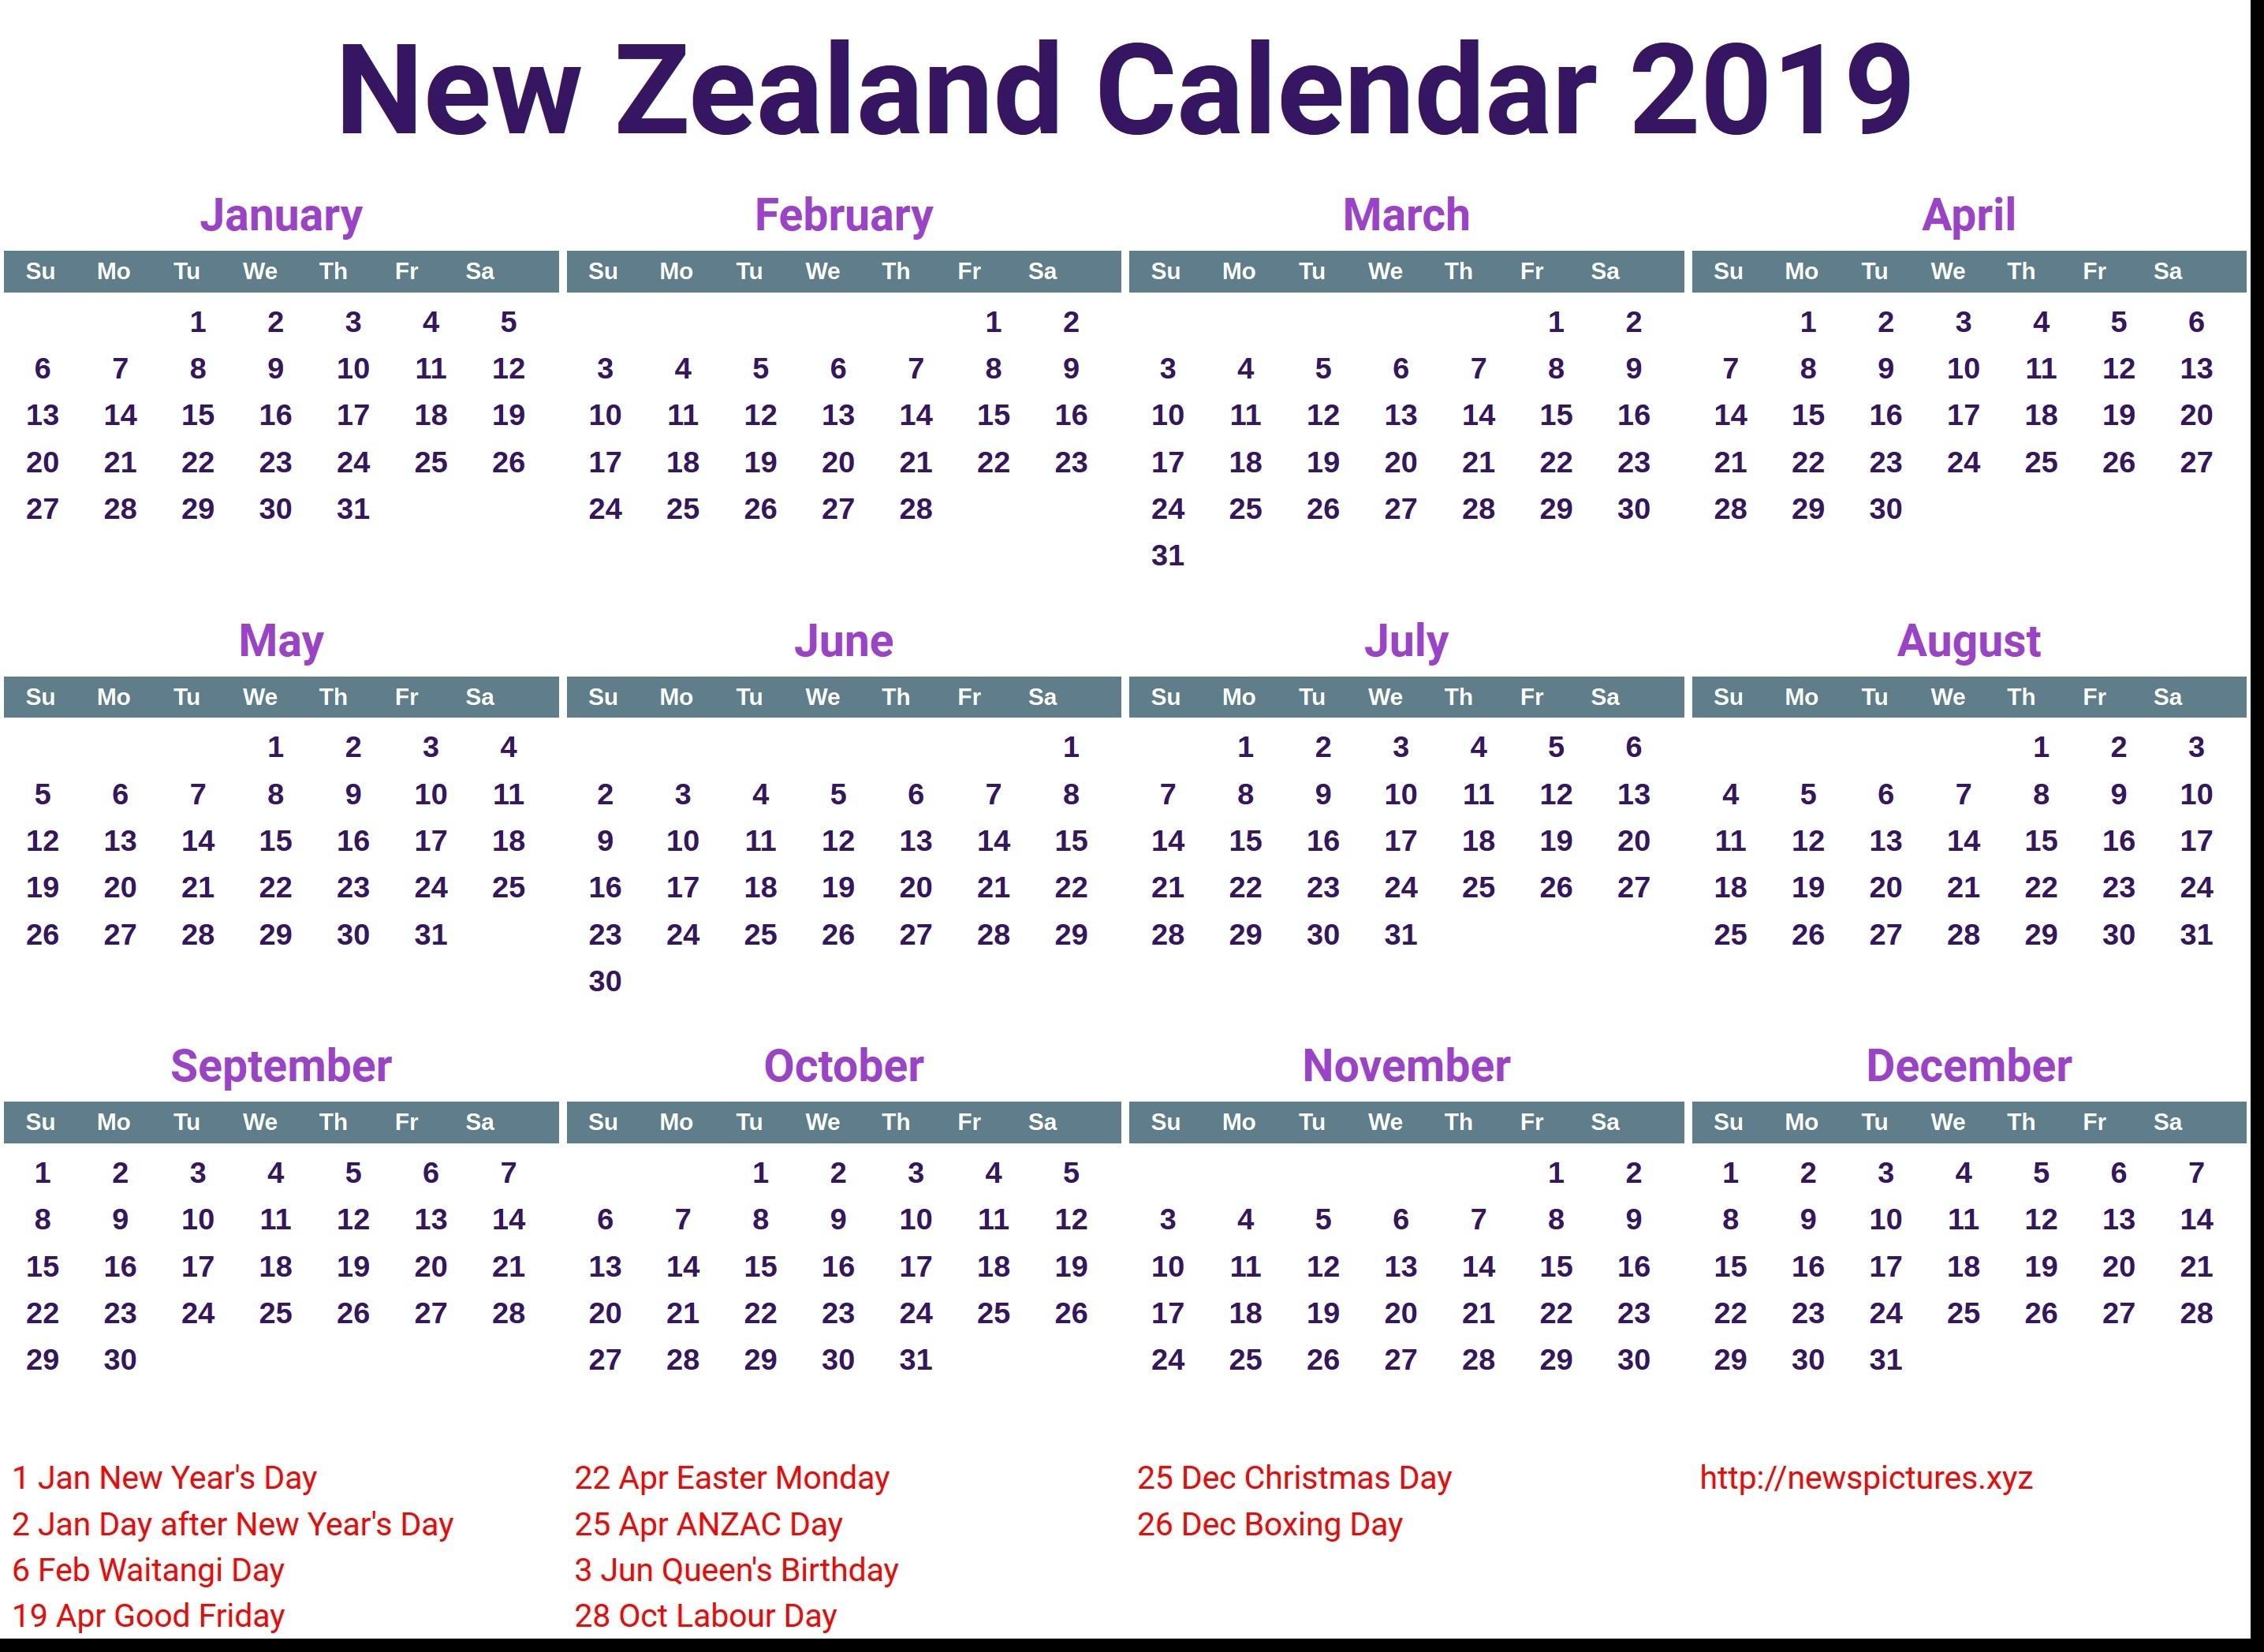 Calendar Nz Holidays 2019 • Printable Blank Calendar Template 2020 Calendar Nz Public Holidays